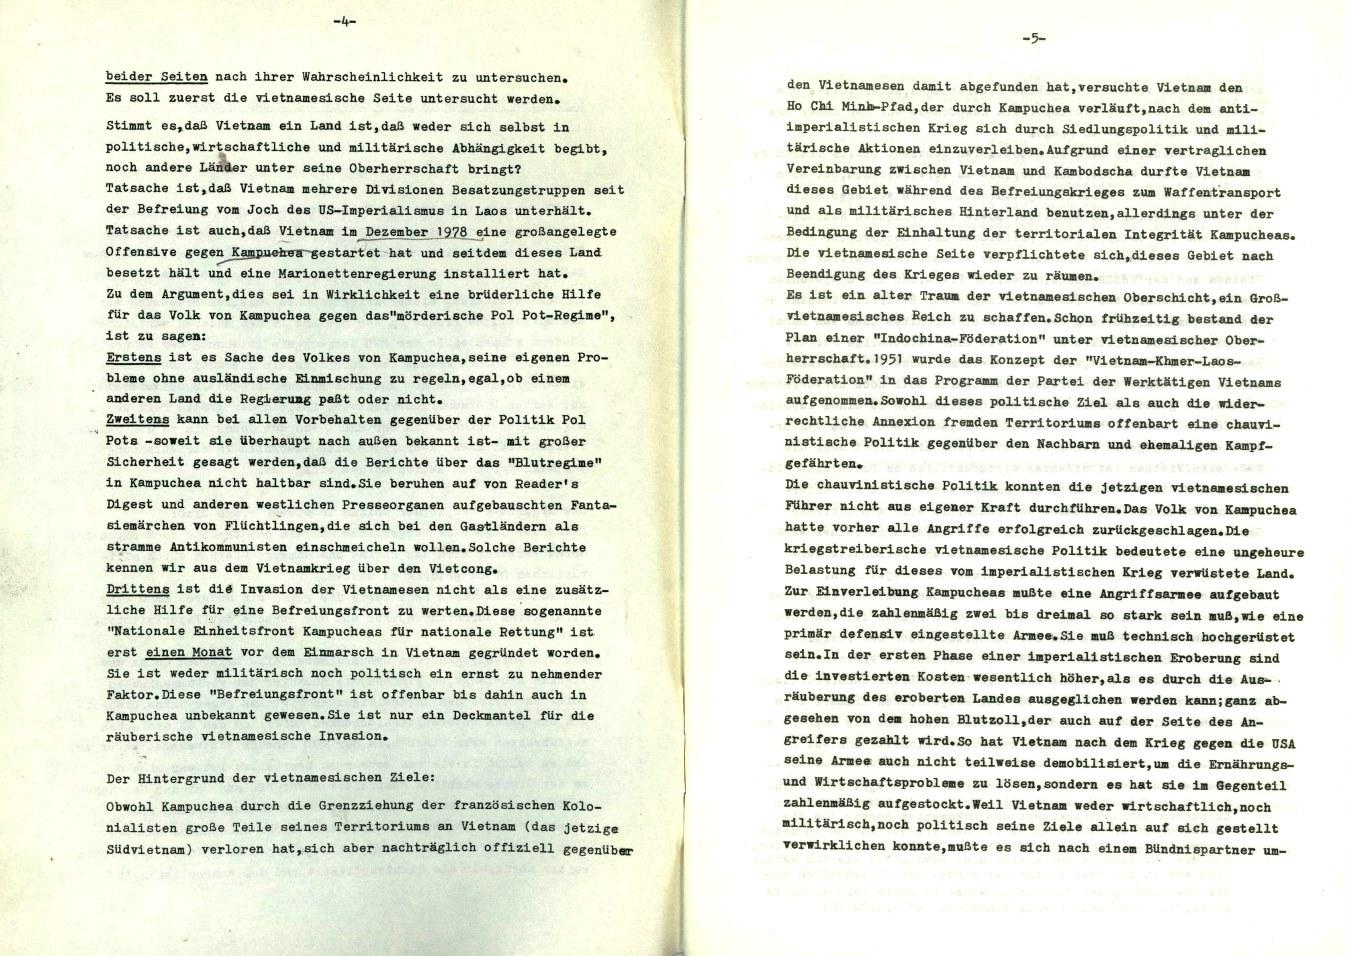 Muenchen_Kampf_dem_Revisionismus_1979_10_03